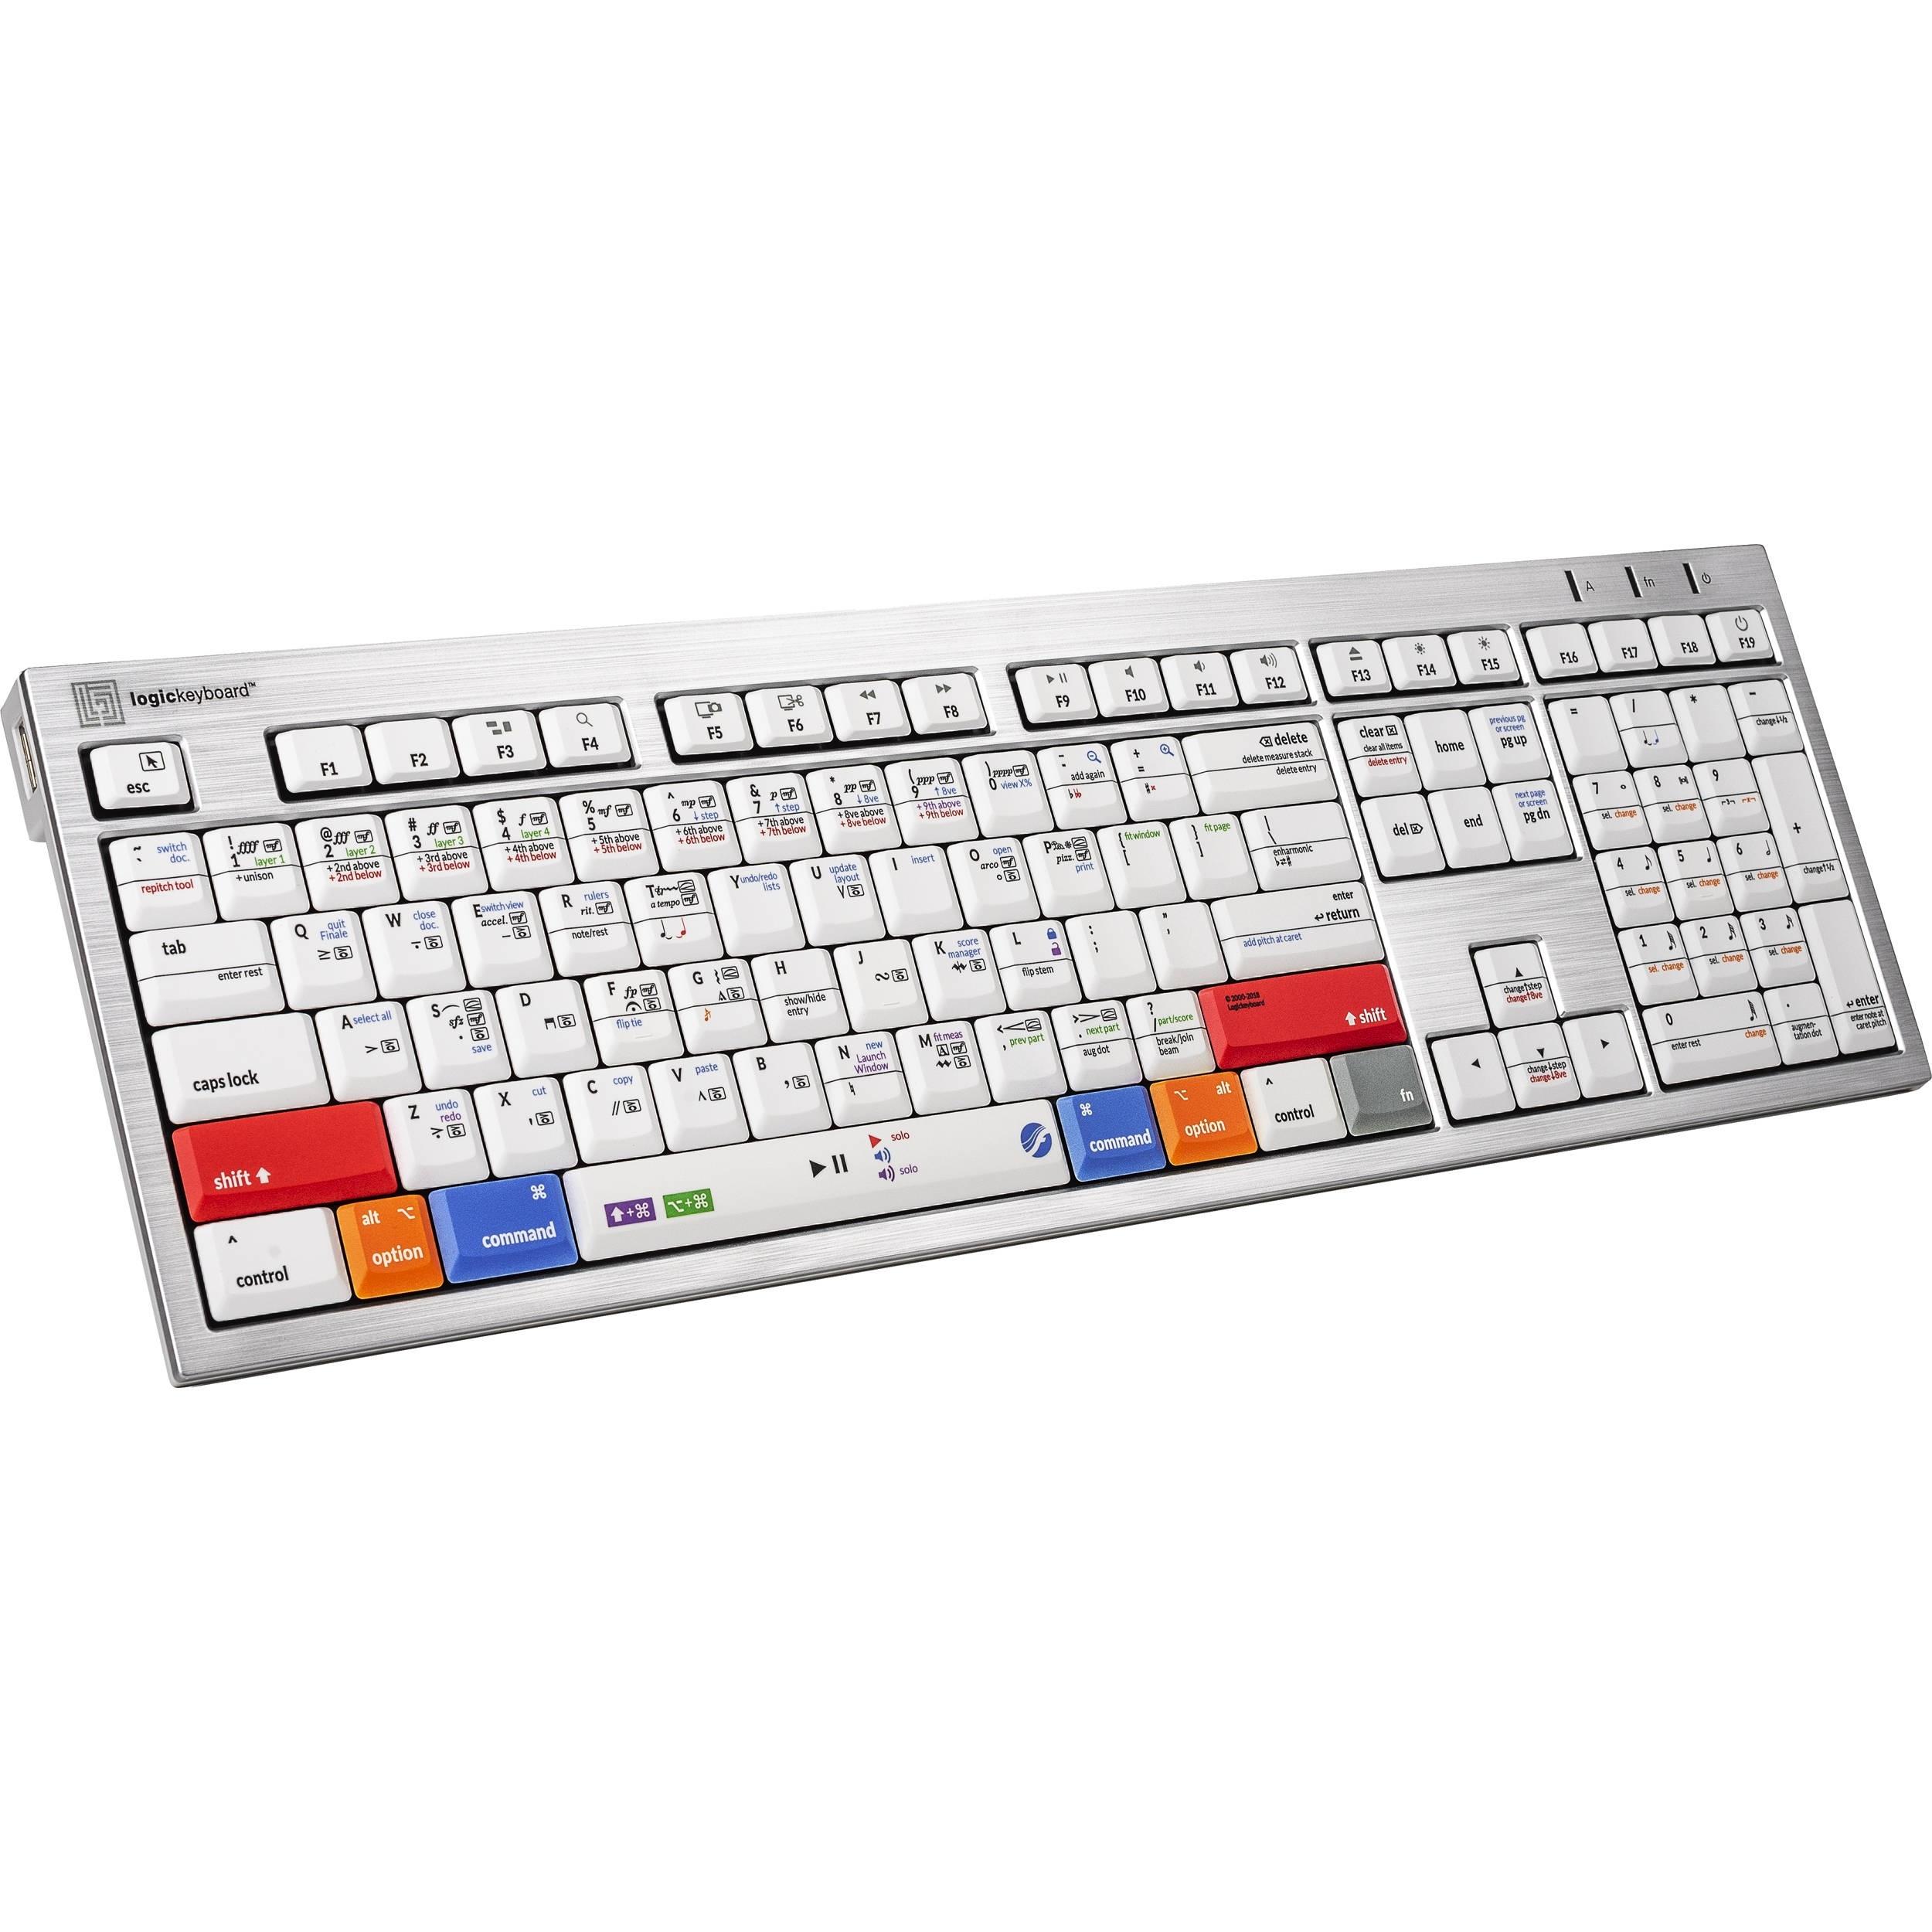 LogicKeyboard ALBA Keyboard for MakeMusic Finale (Mac, American English)